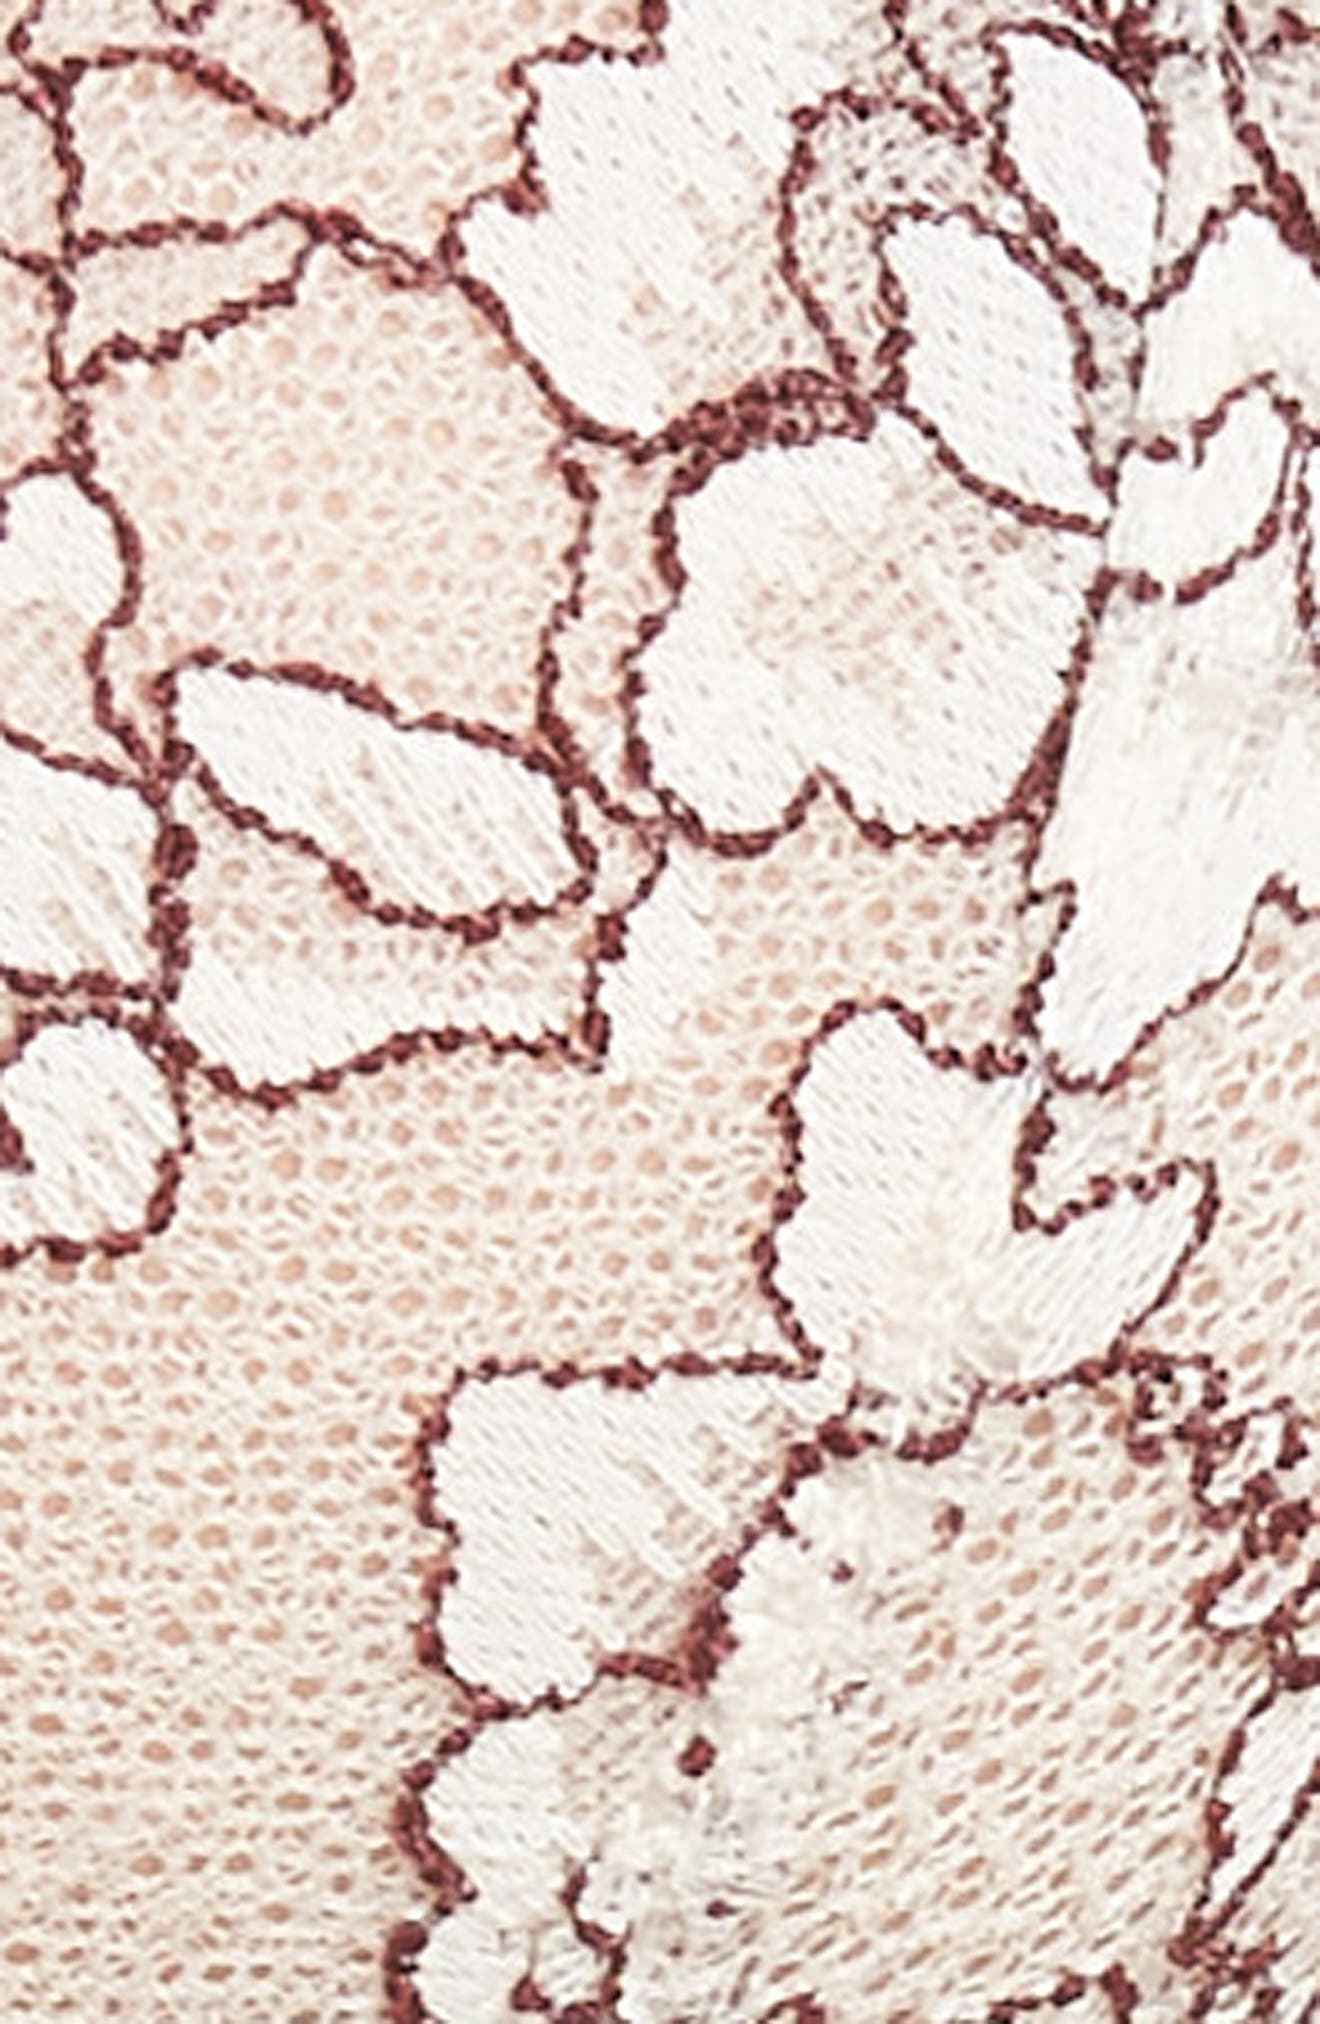 'Minx' Unlined Lace Demi Underwire Bra,                             Alternate thumbnail 77, color,